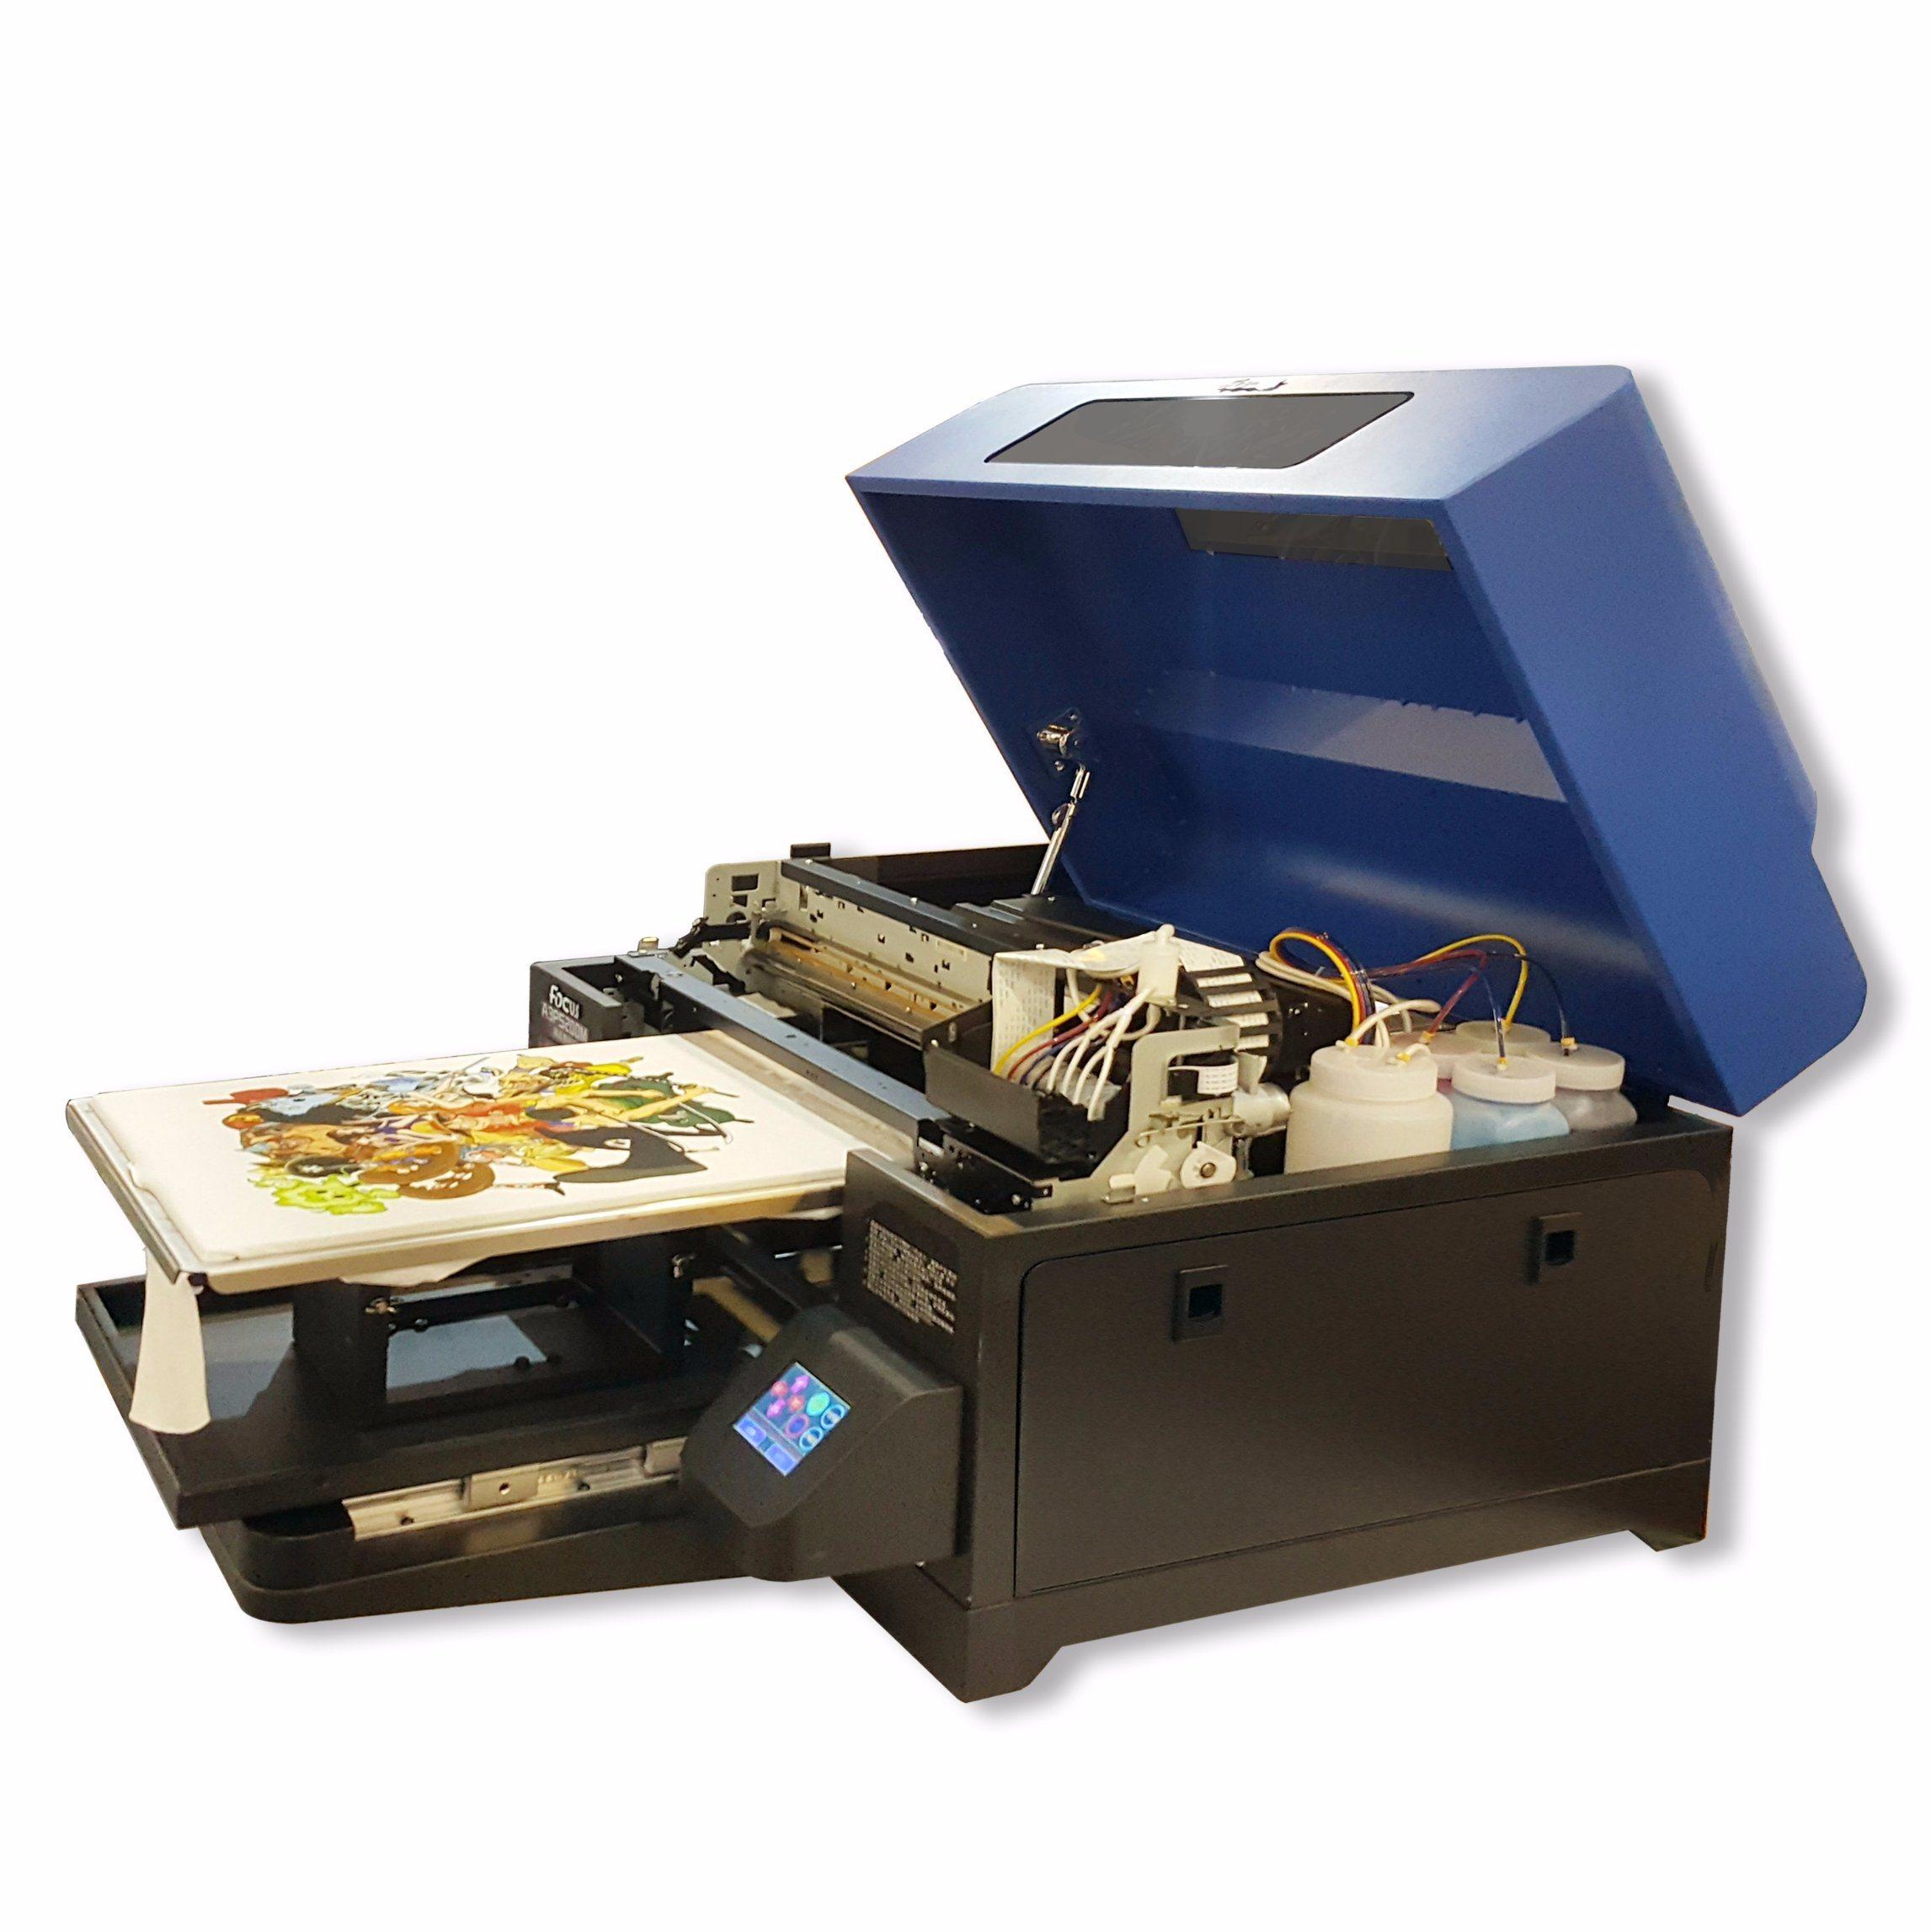 Diy Flatbed Printer Pdf   Diydrywalls org